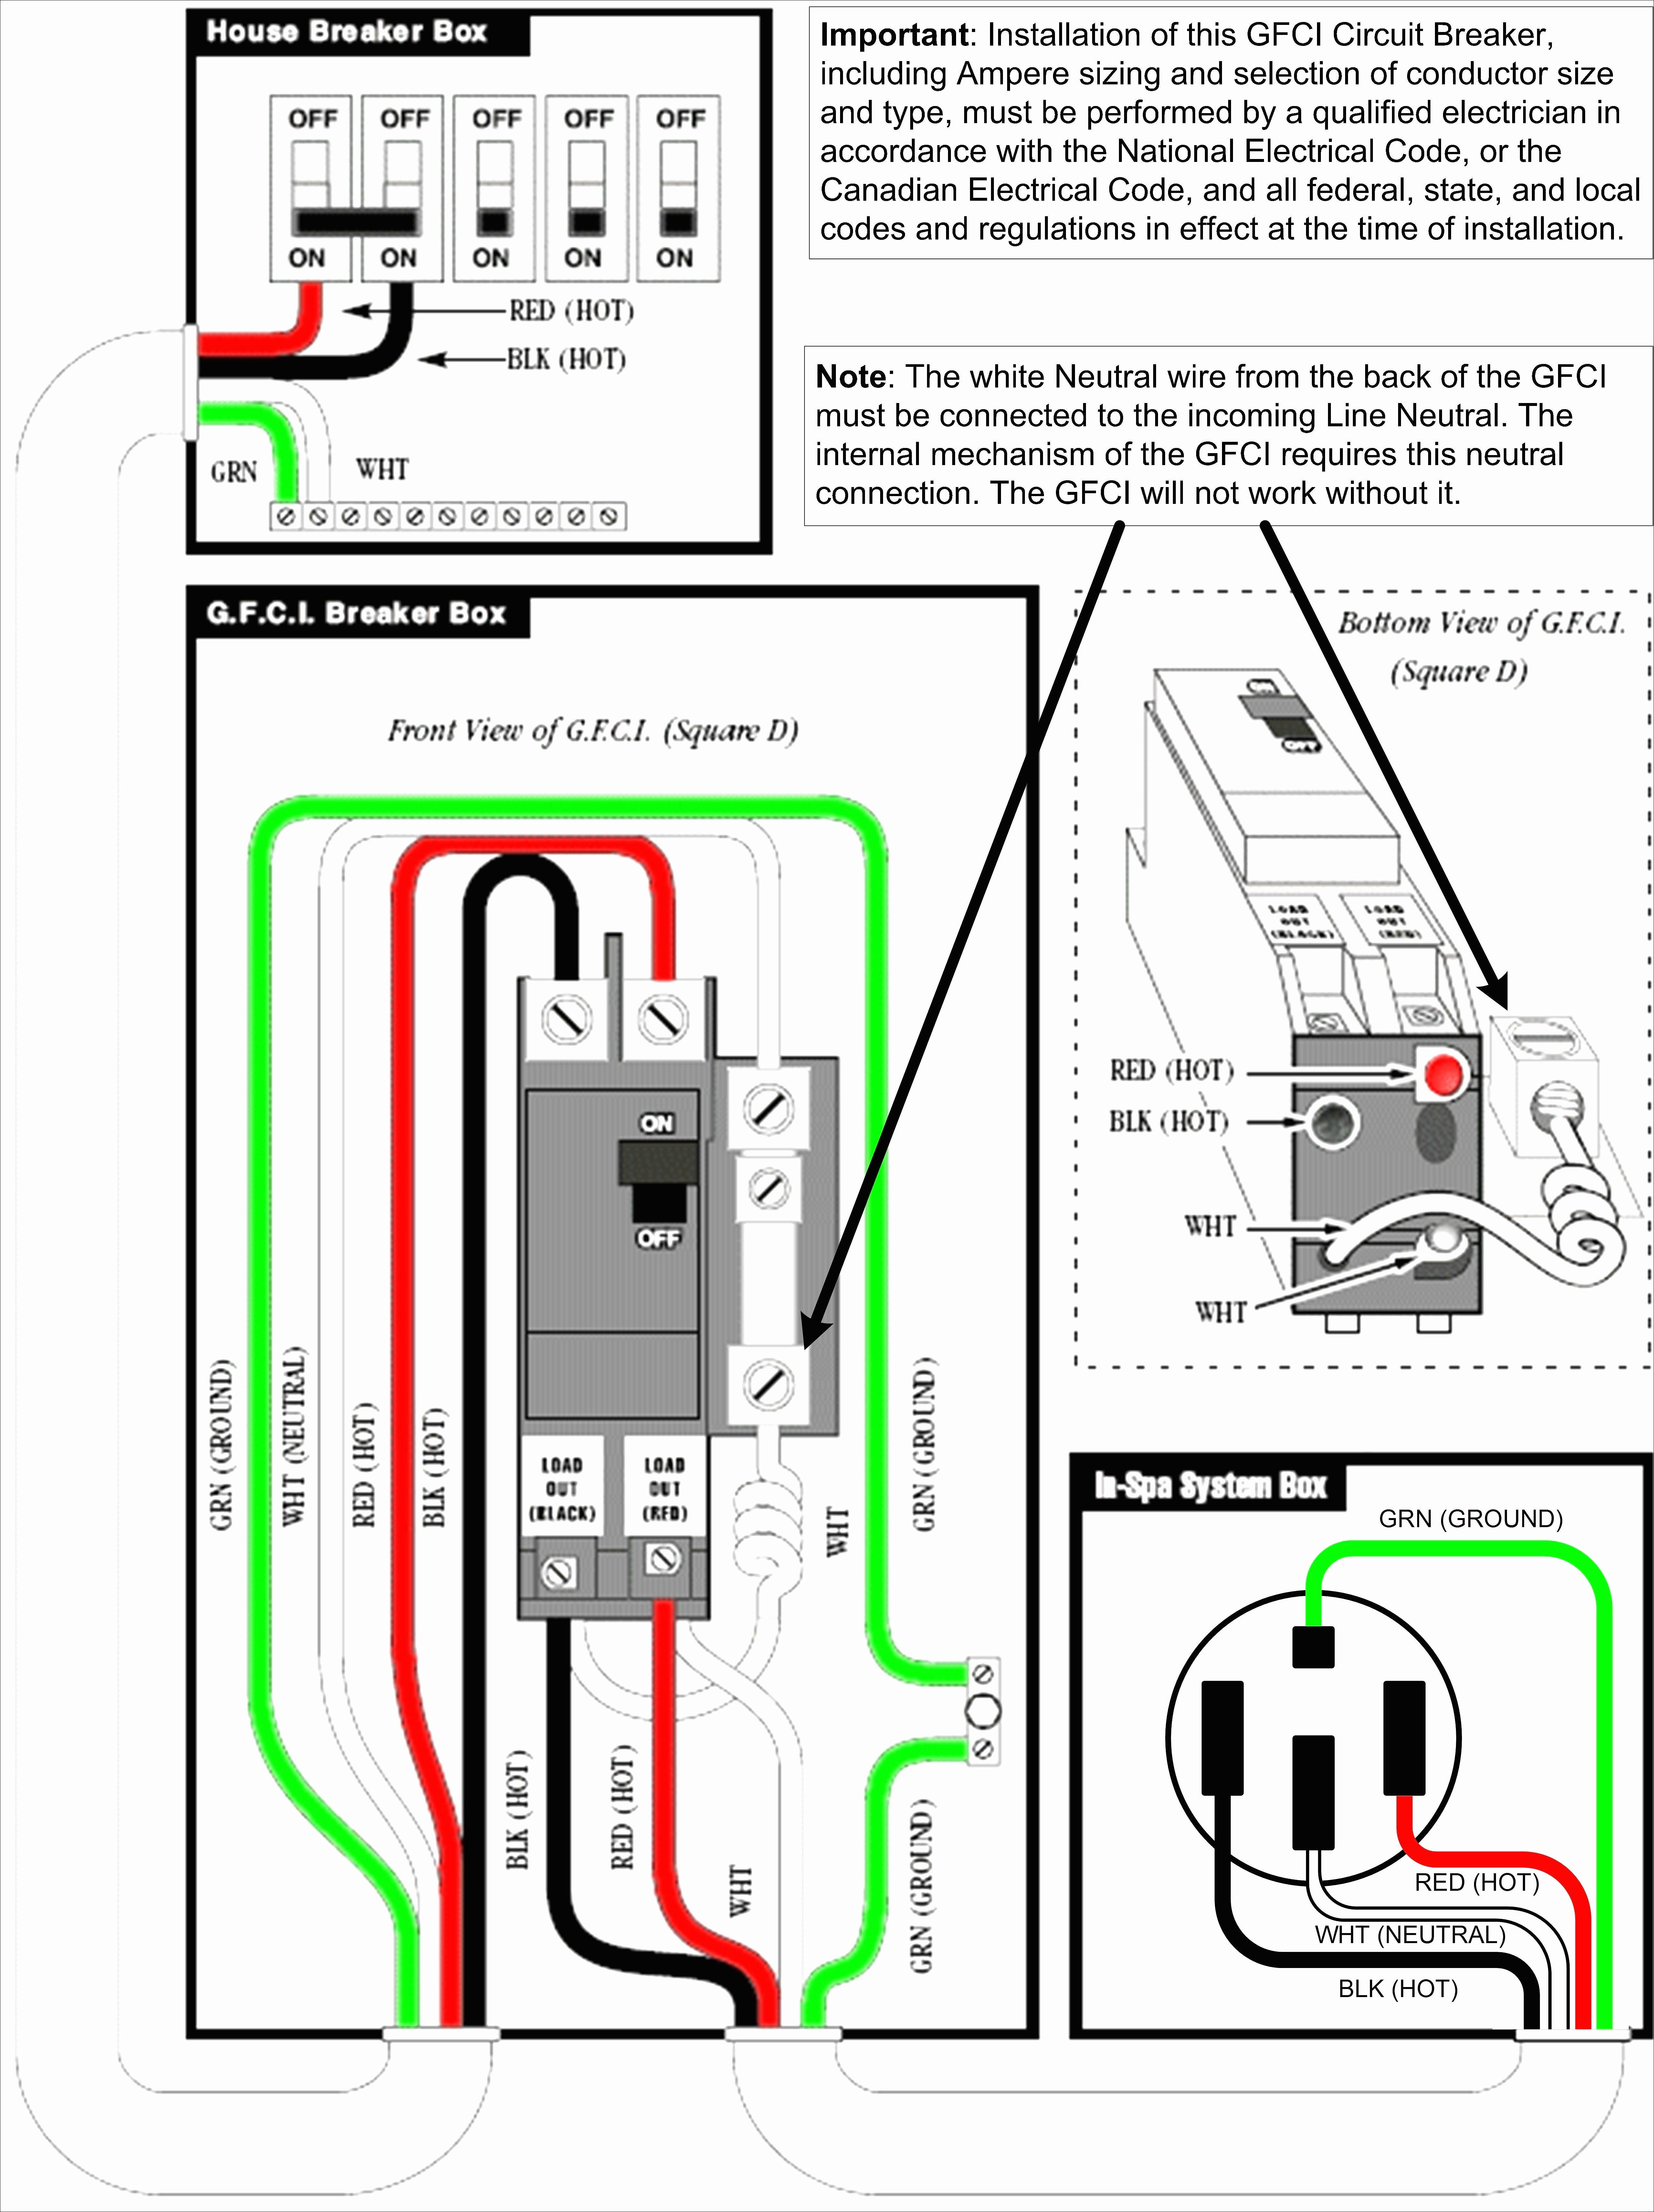 Electrical Circuit Breaker Panel Diagram Percychristian Electrical Circuit Breaker Panel Diagram Http Percychristian